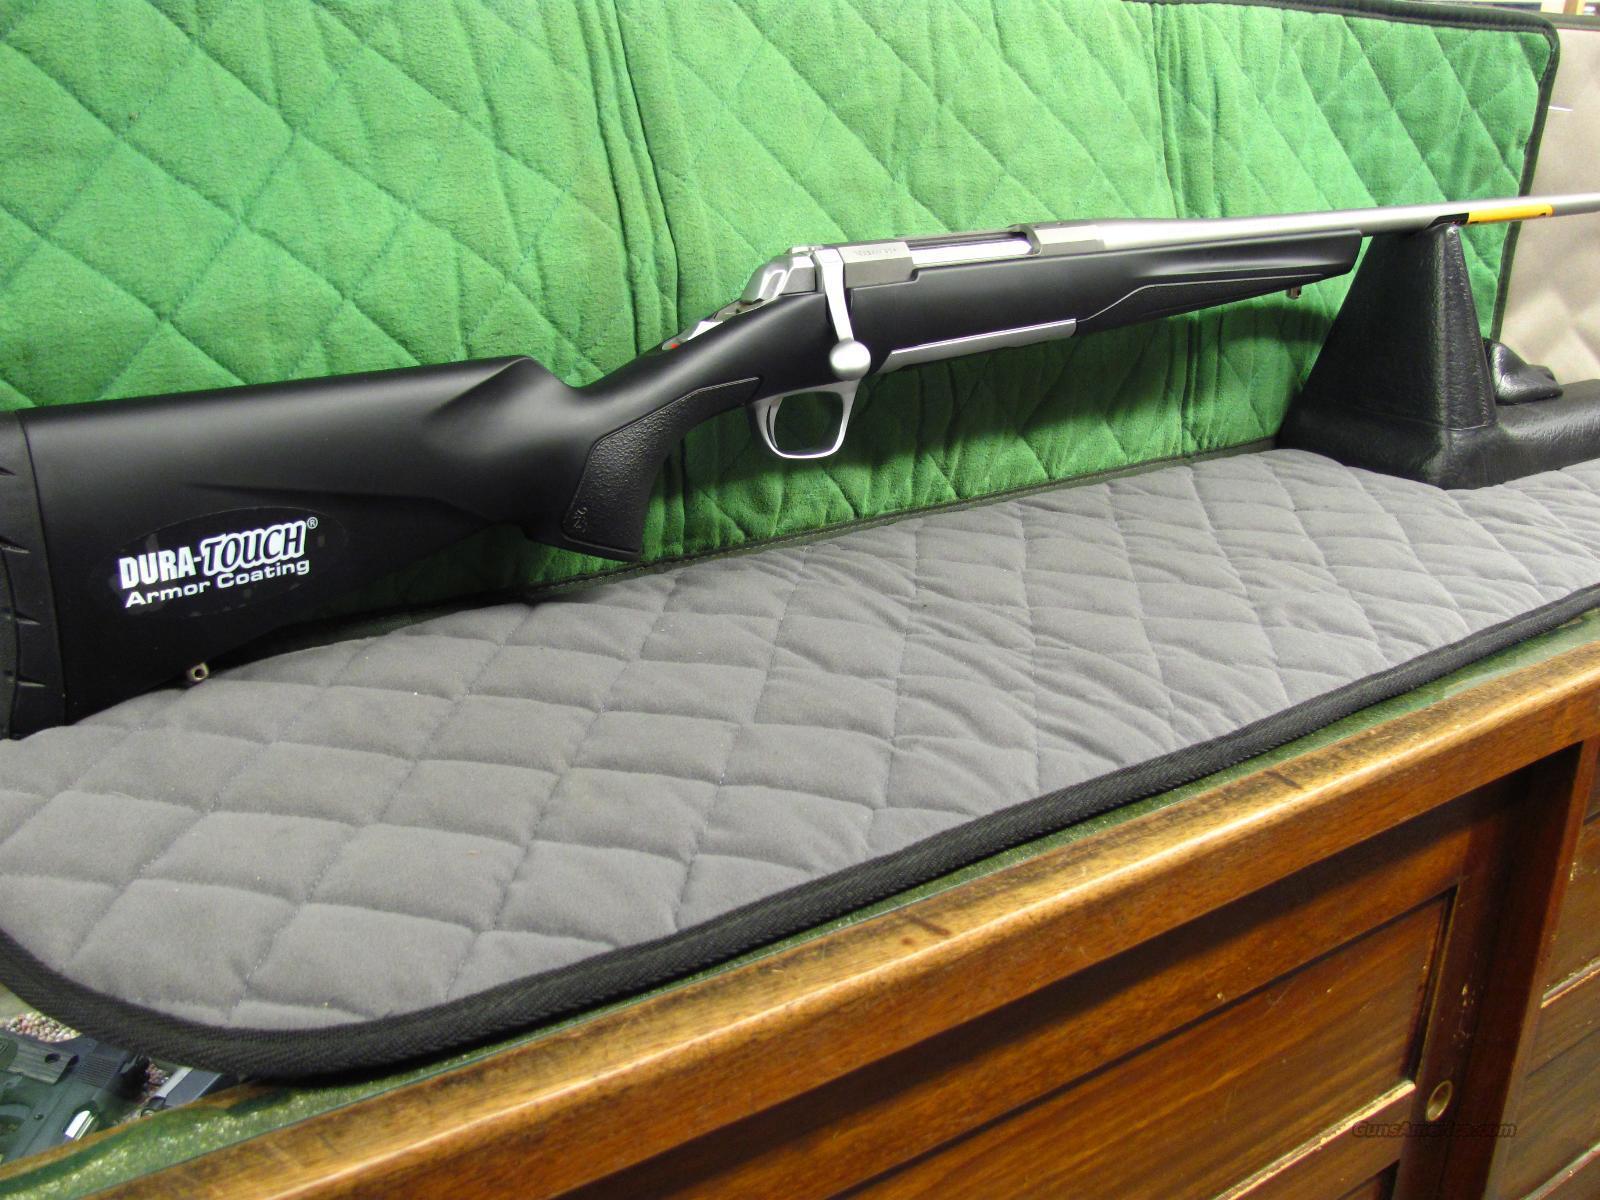 Browning X-Bolt Stainless Stalker 270 Win  **NEW**  Guns > Rifles > Browning Rifles > Bolt Action > Hunting > Stainless